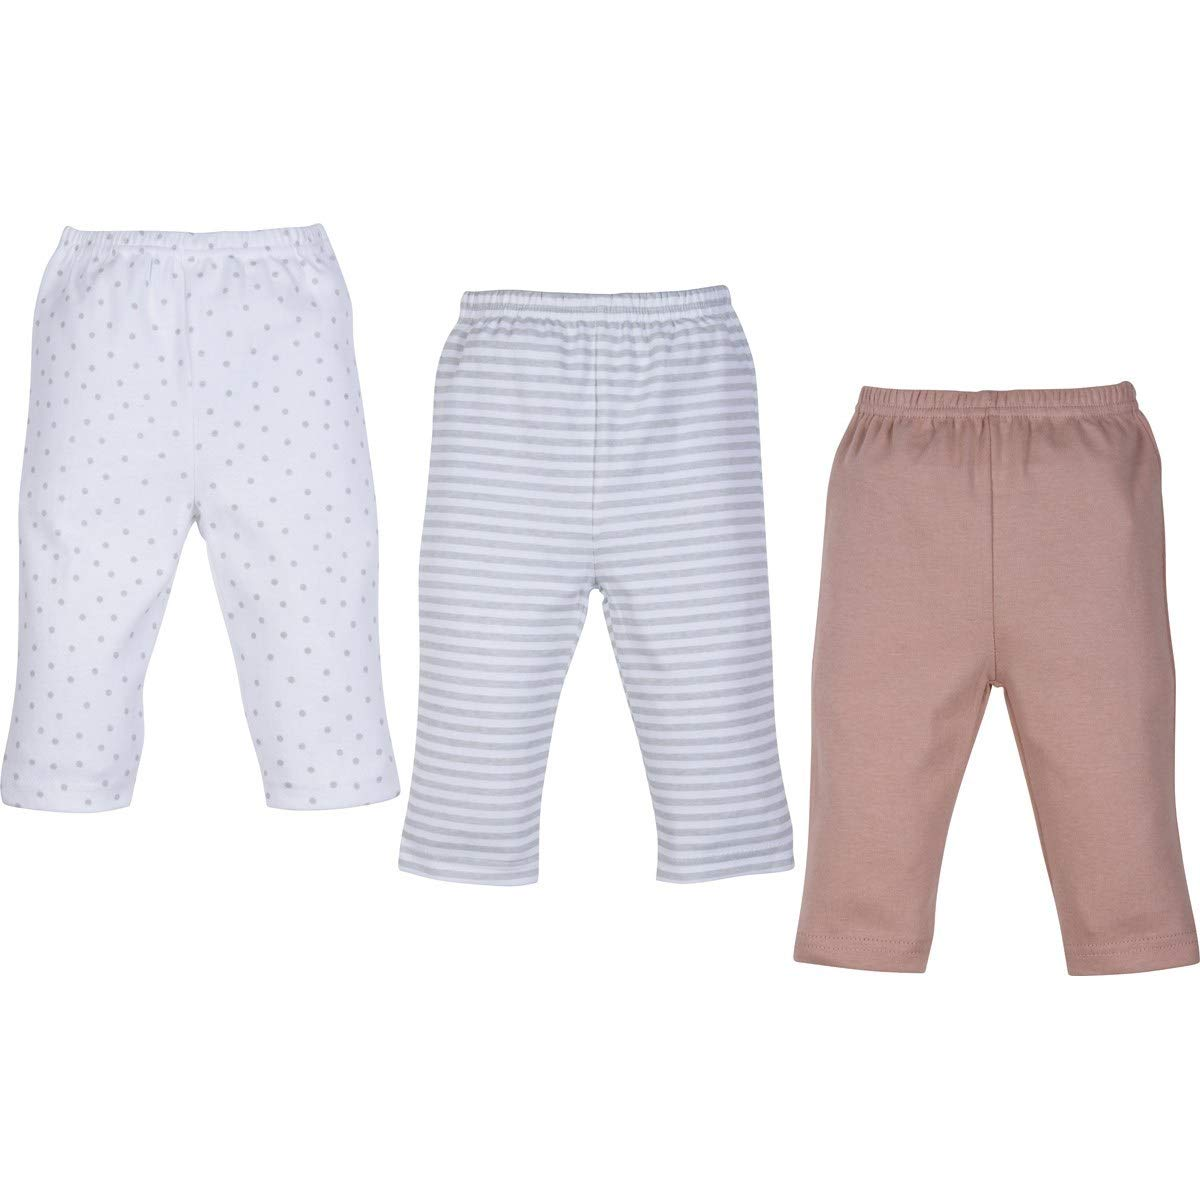 6-9 Months, Boy MiracleWear 3-Pack Pants